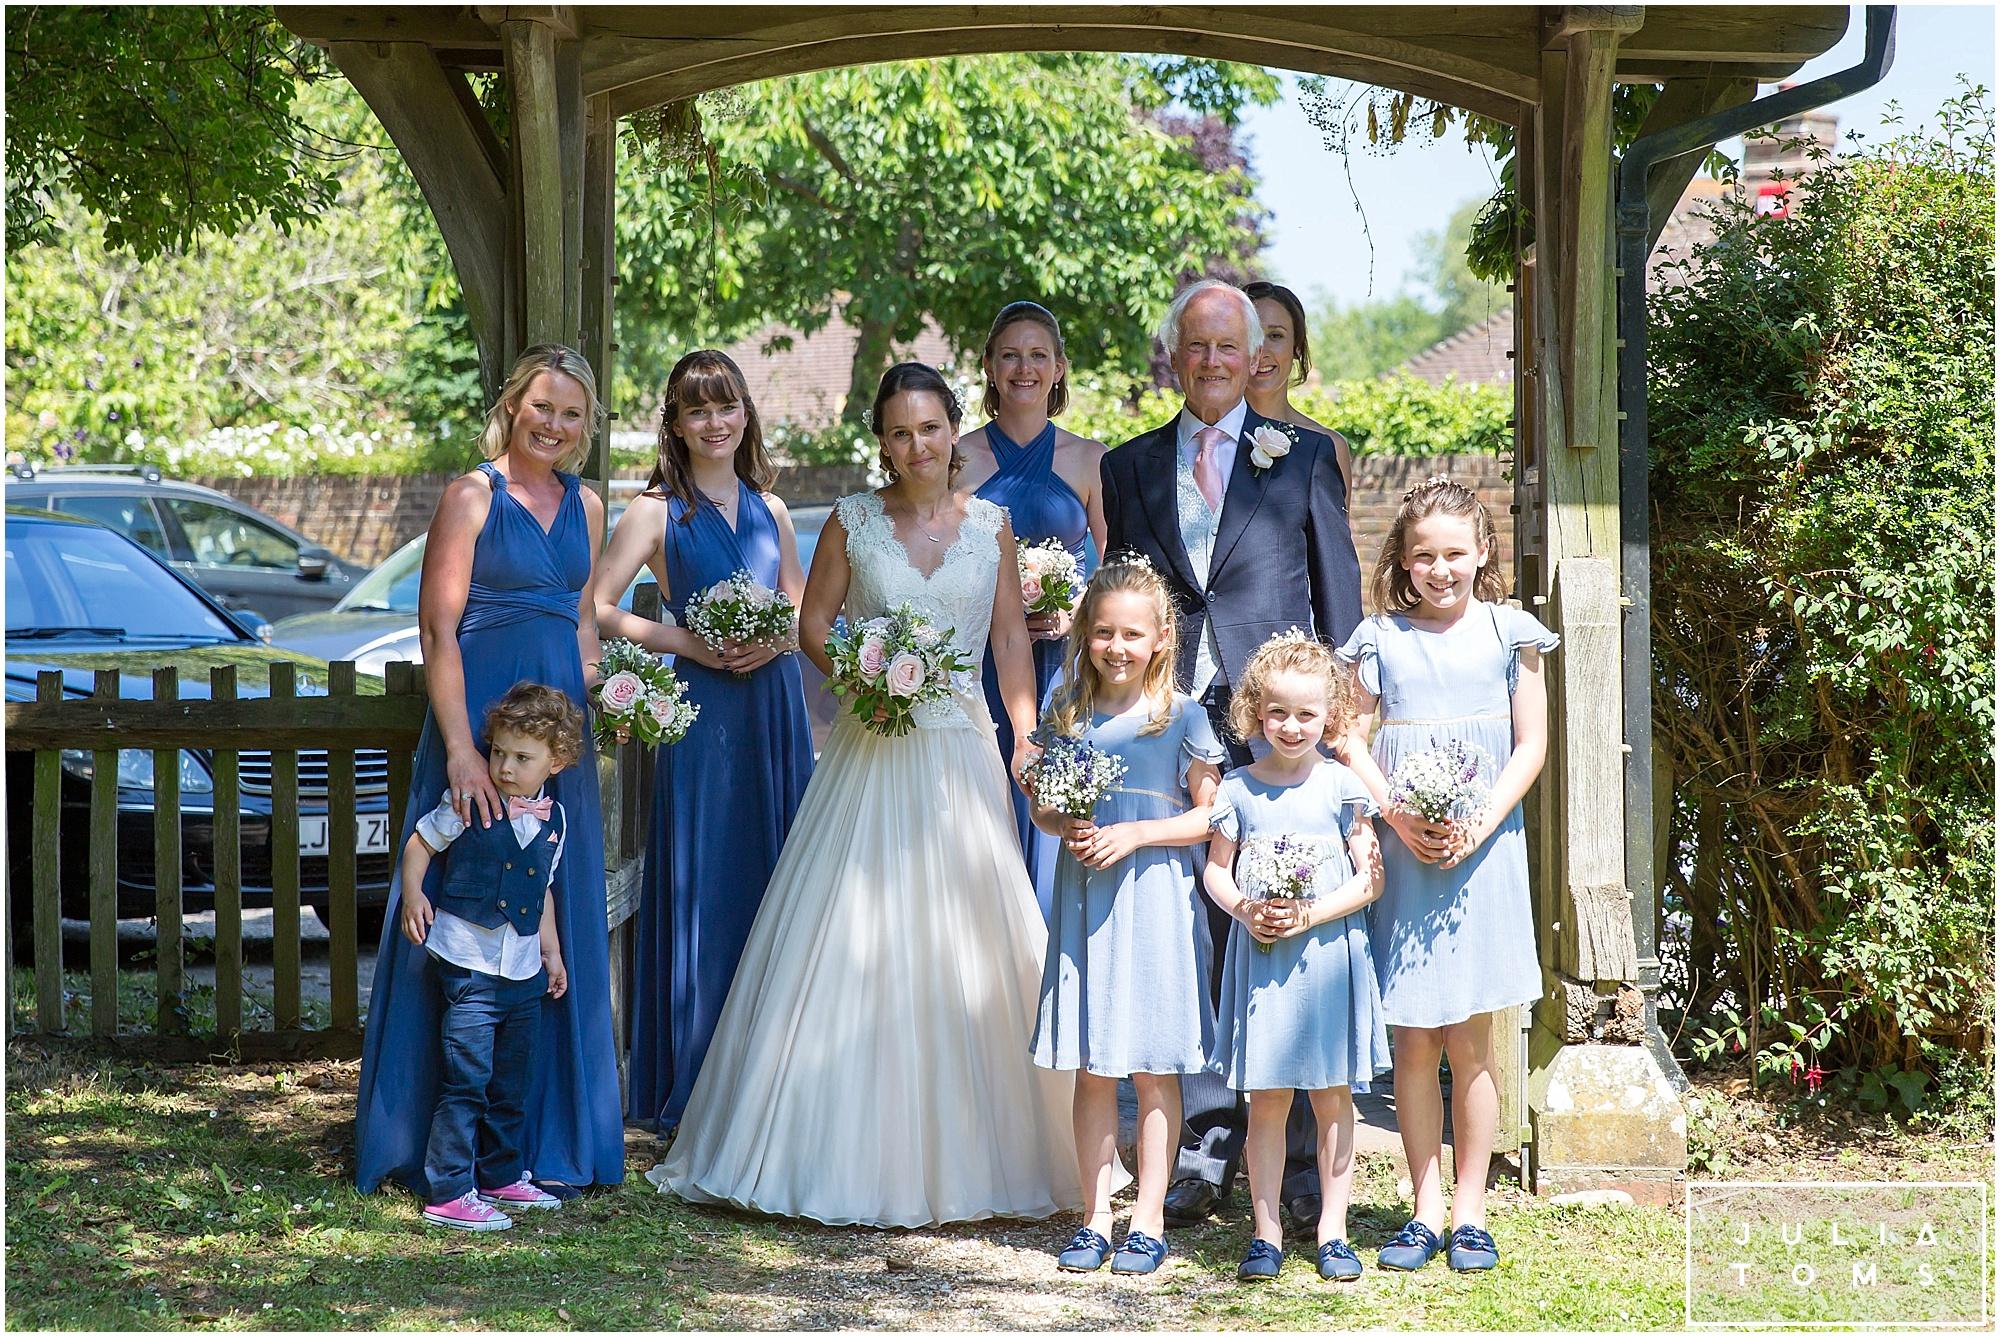 julia_toms_chichester_wedding_photographer_portsmouth_022.jpg